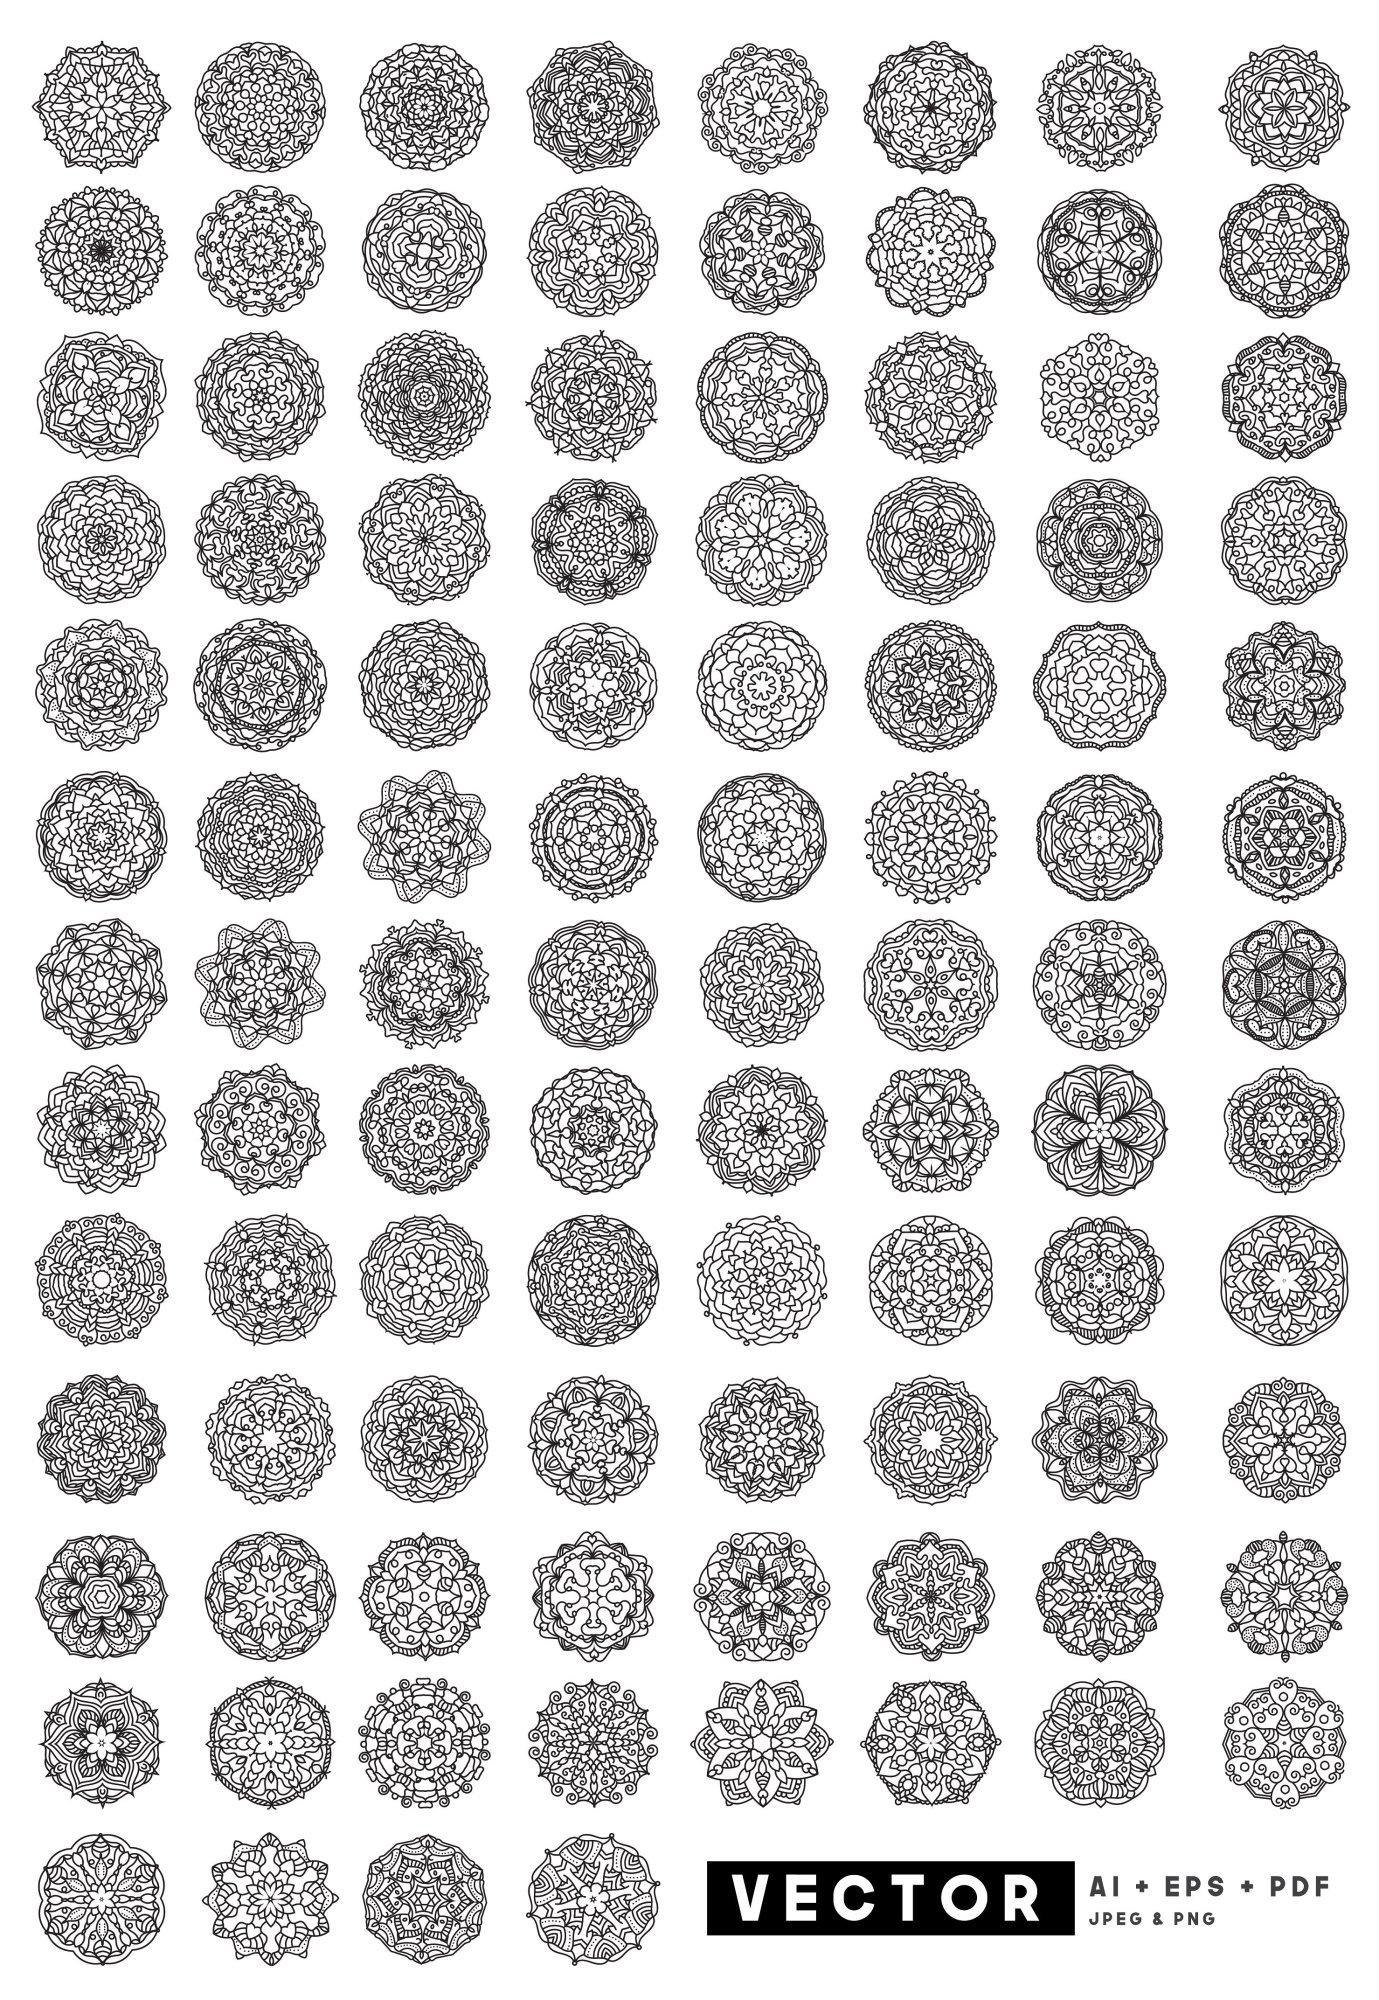 100 Vector Mandala Floral Ornaments example image 2